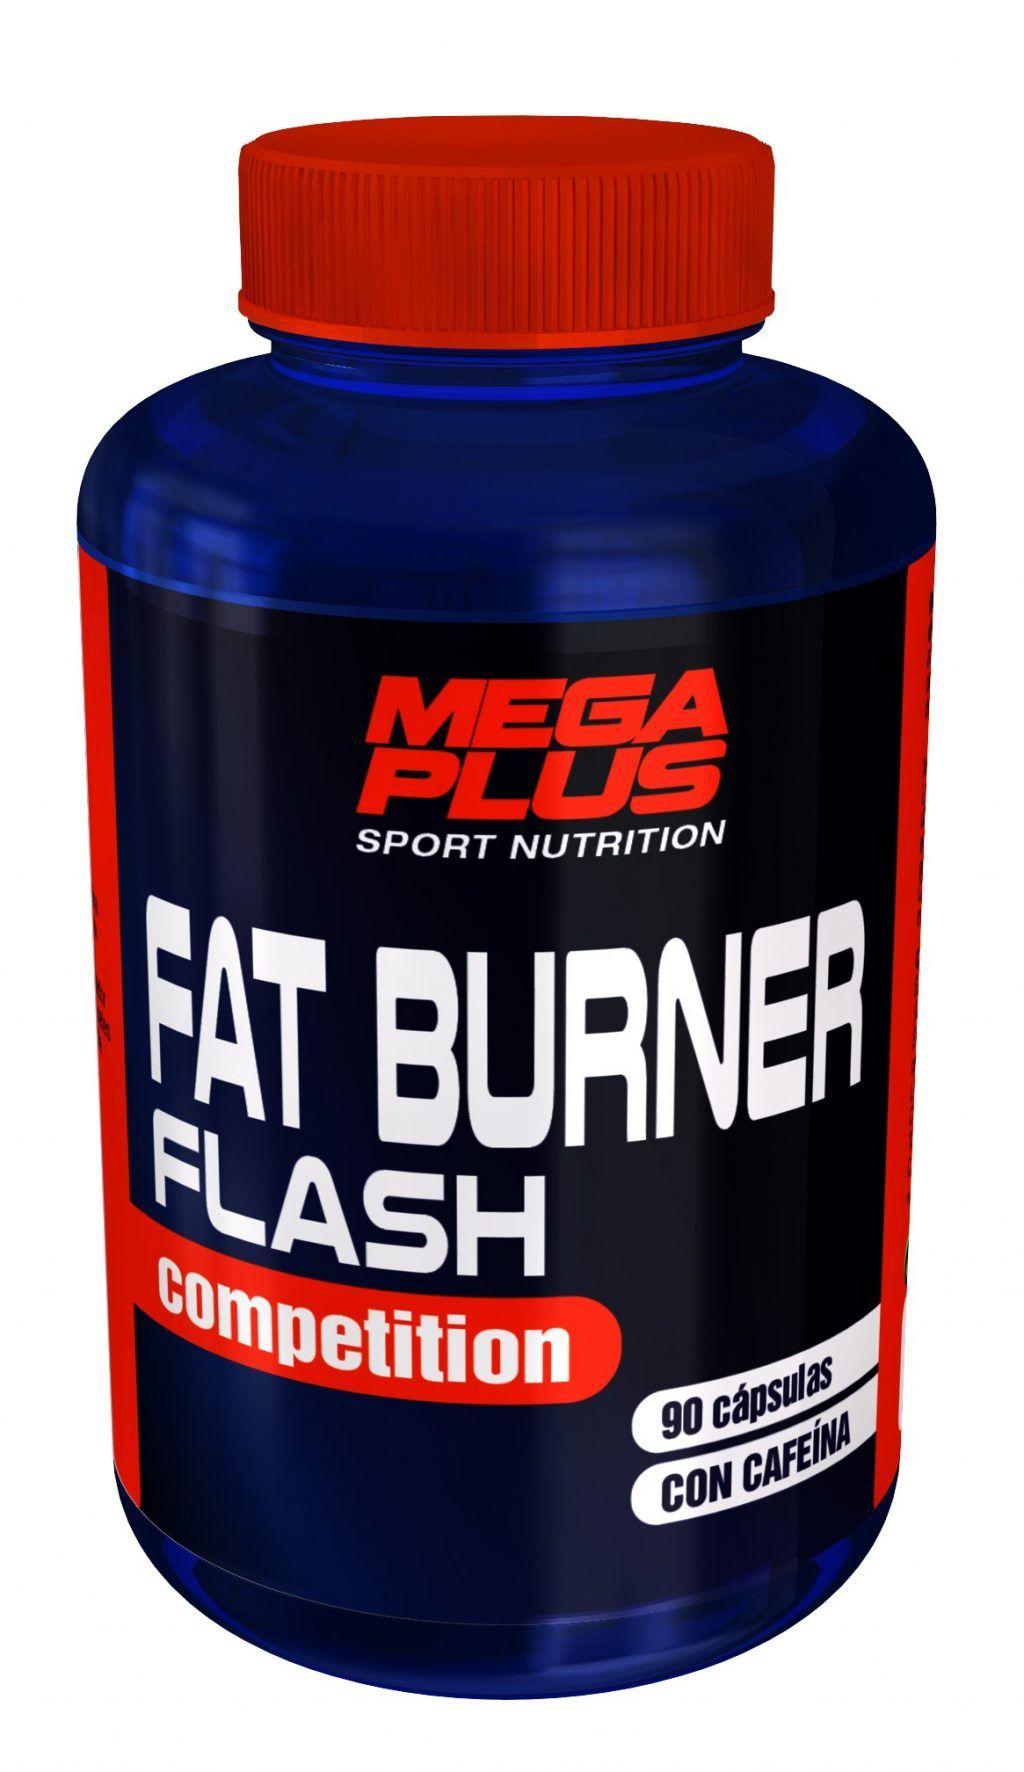 FAT BURNER FLASH 90 CAPS. MEGA PLUS